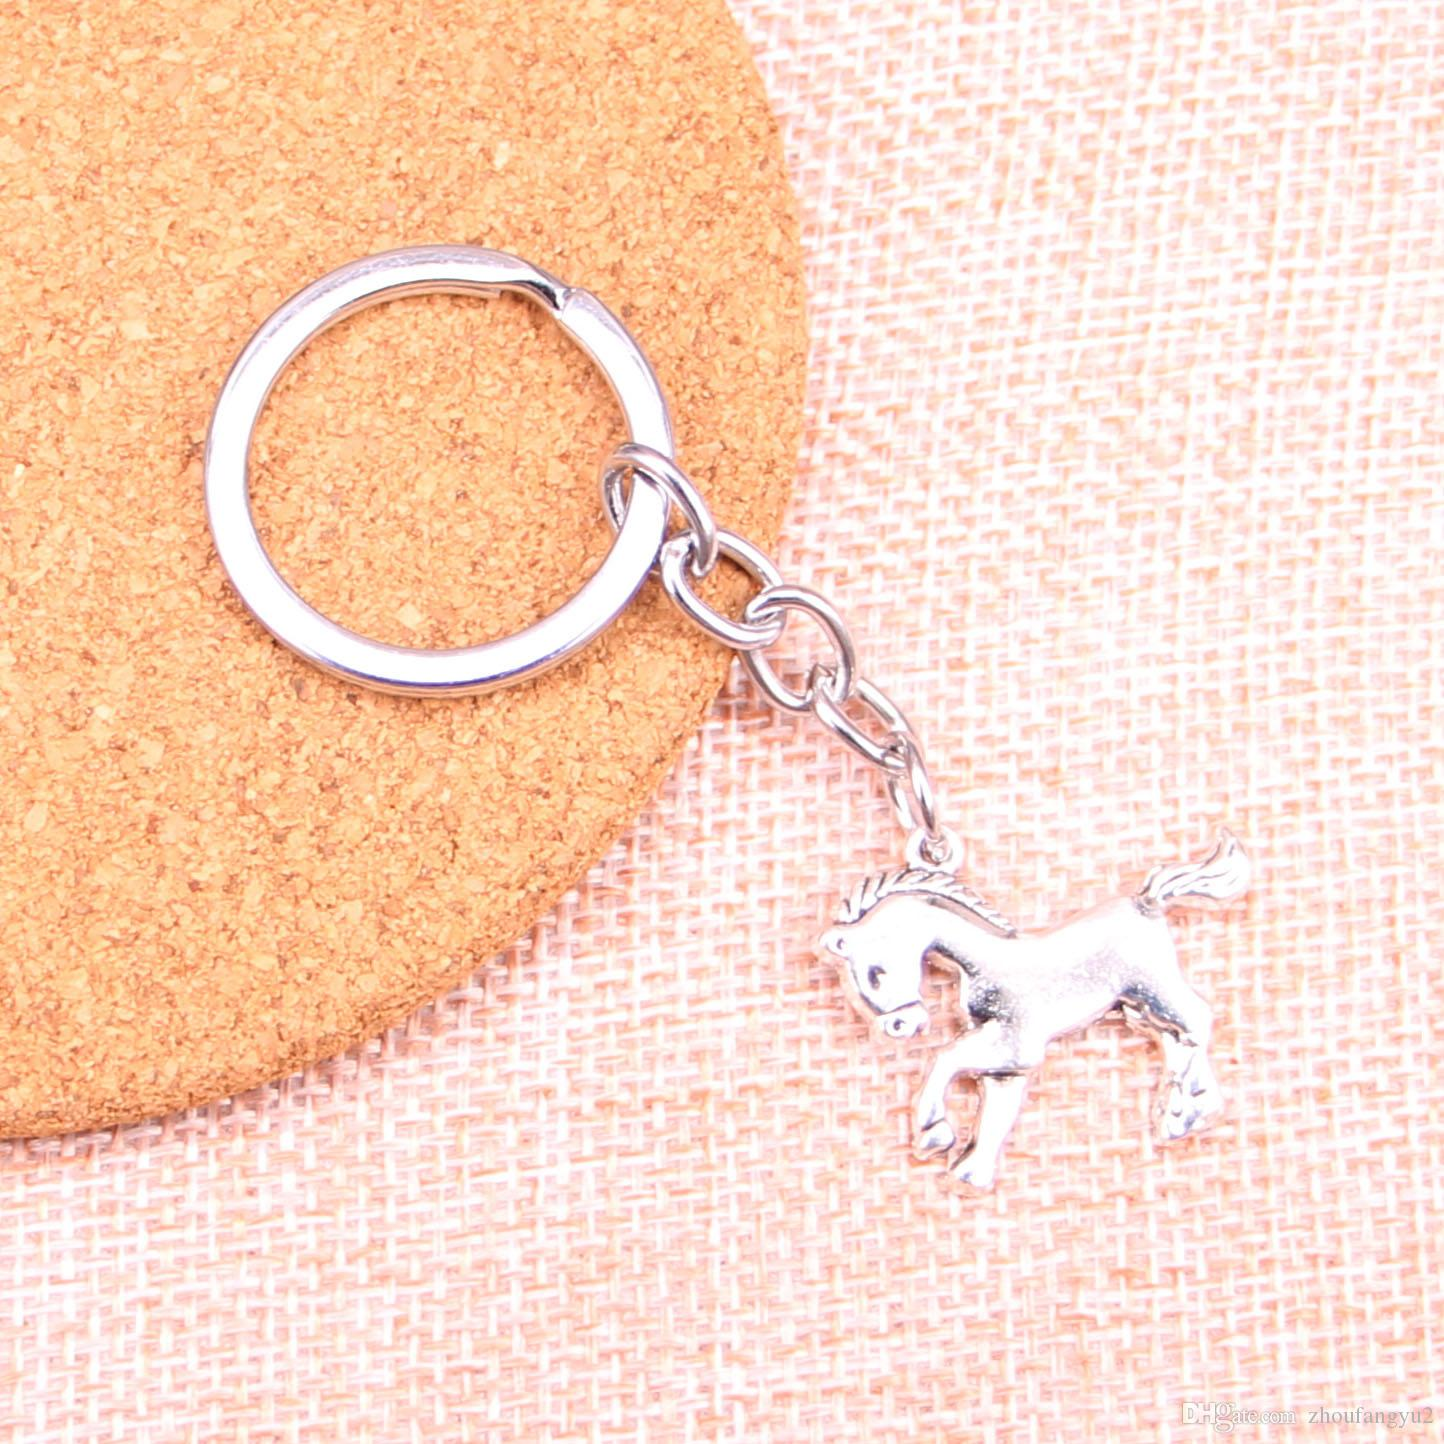 23 * 25 milímetros cavalo corcel KeyChain, New Handmade Metal Keychain Fashion Party presente Dropship Jóias